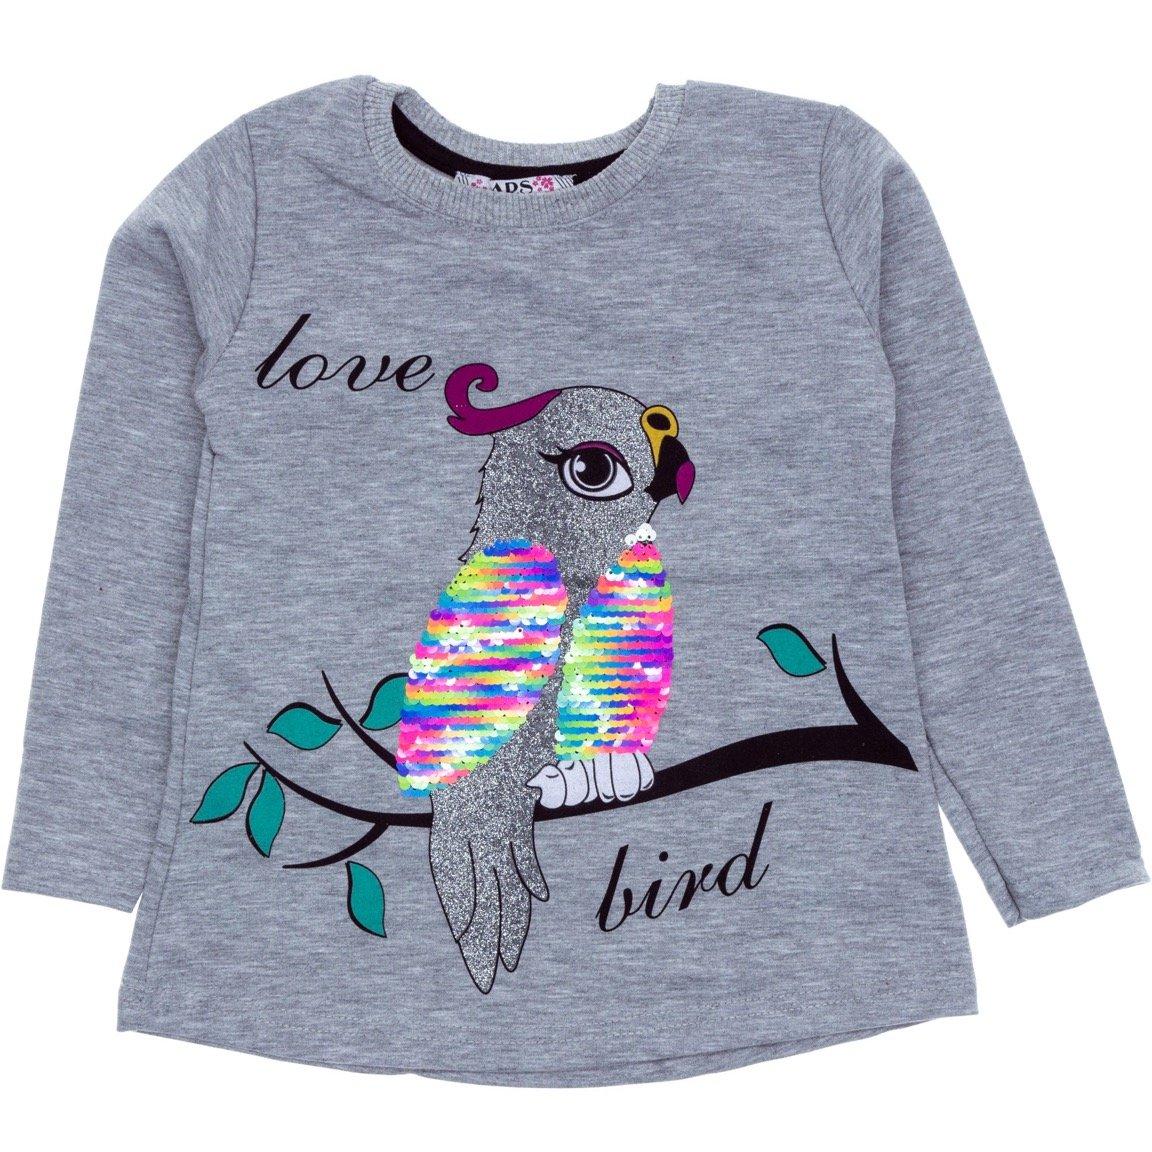 ARS παιδική εποχιακή μπλούζα «My Love Bird»